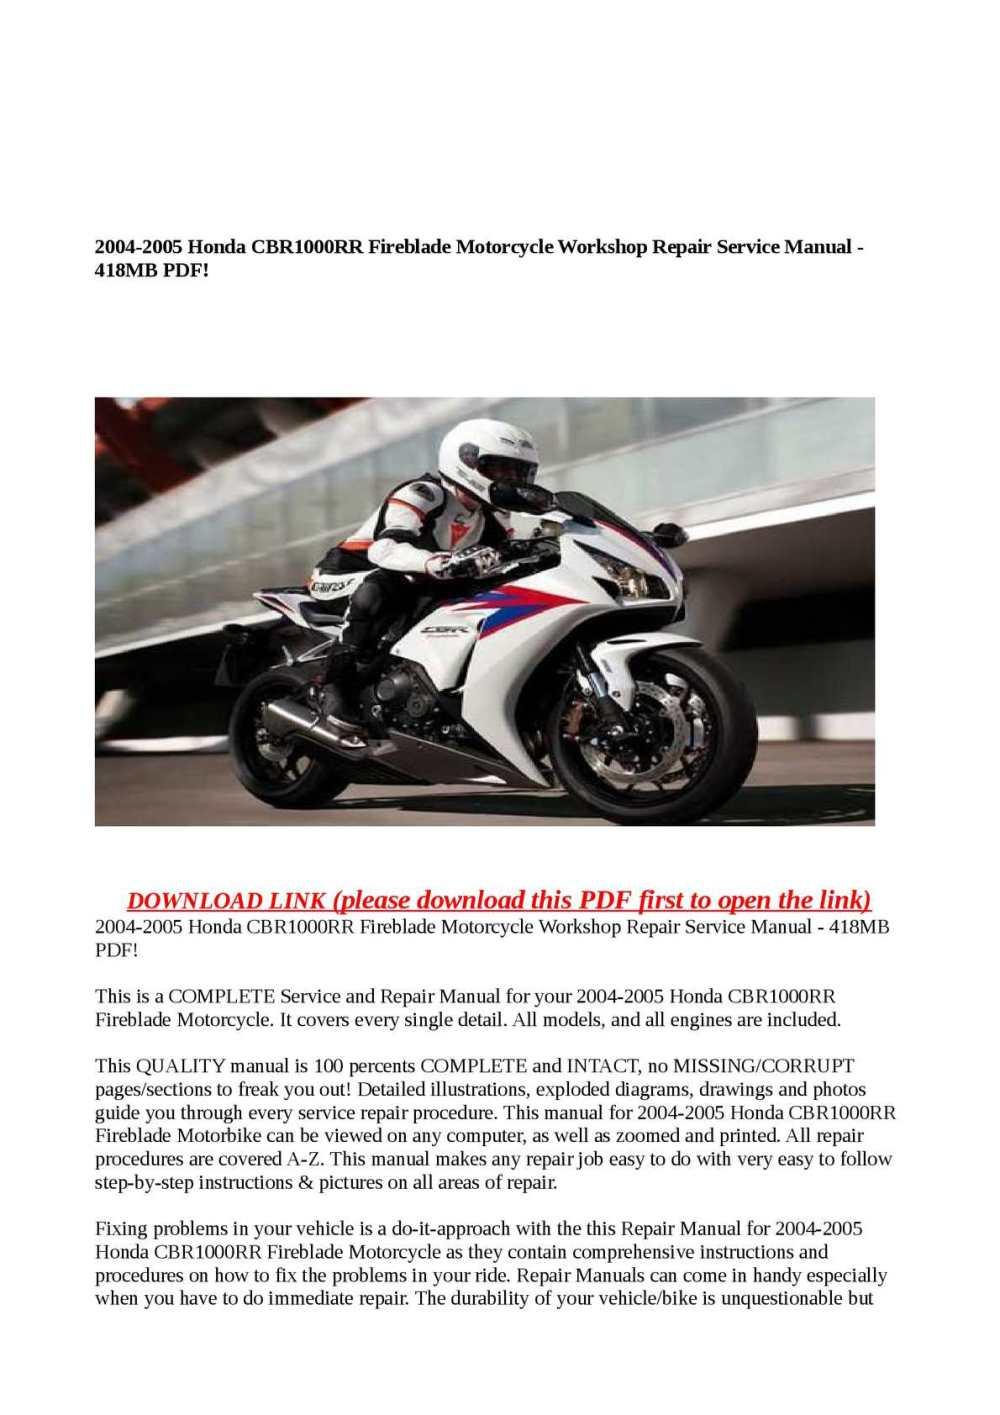 medium resolution of 2004 2005 honda cbr1000rr fireblade motorcycle workshop repair service manual 418mb pdf